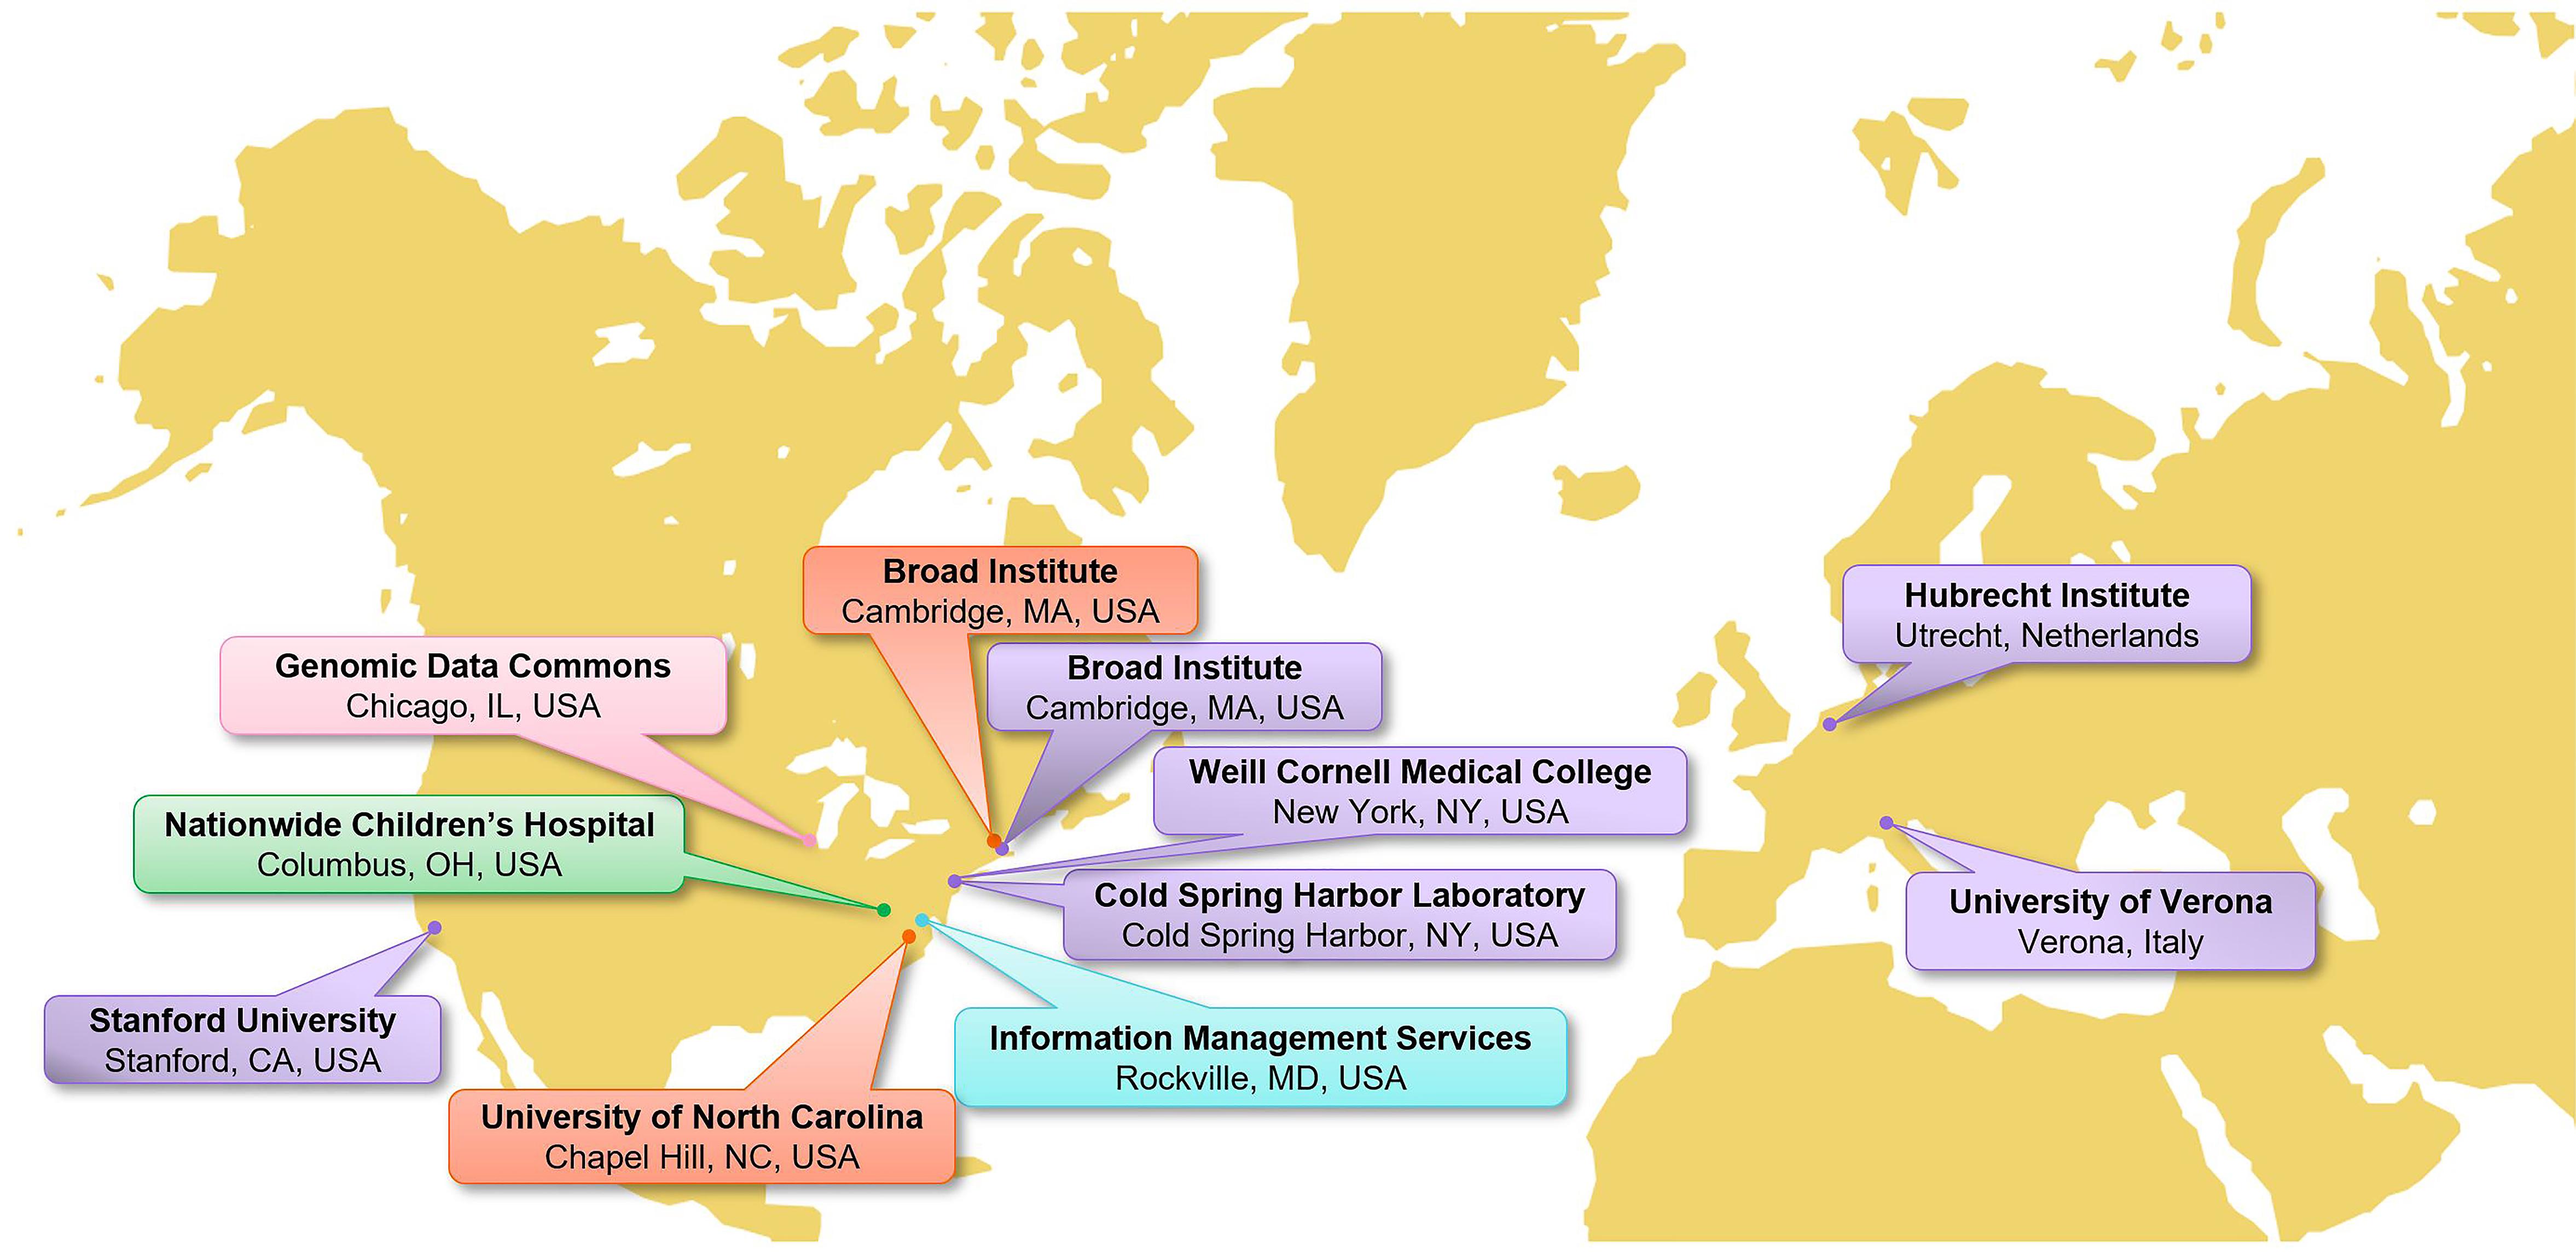 NCI cancer model development centers